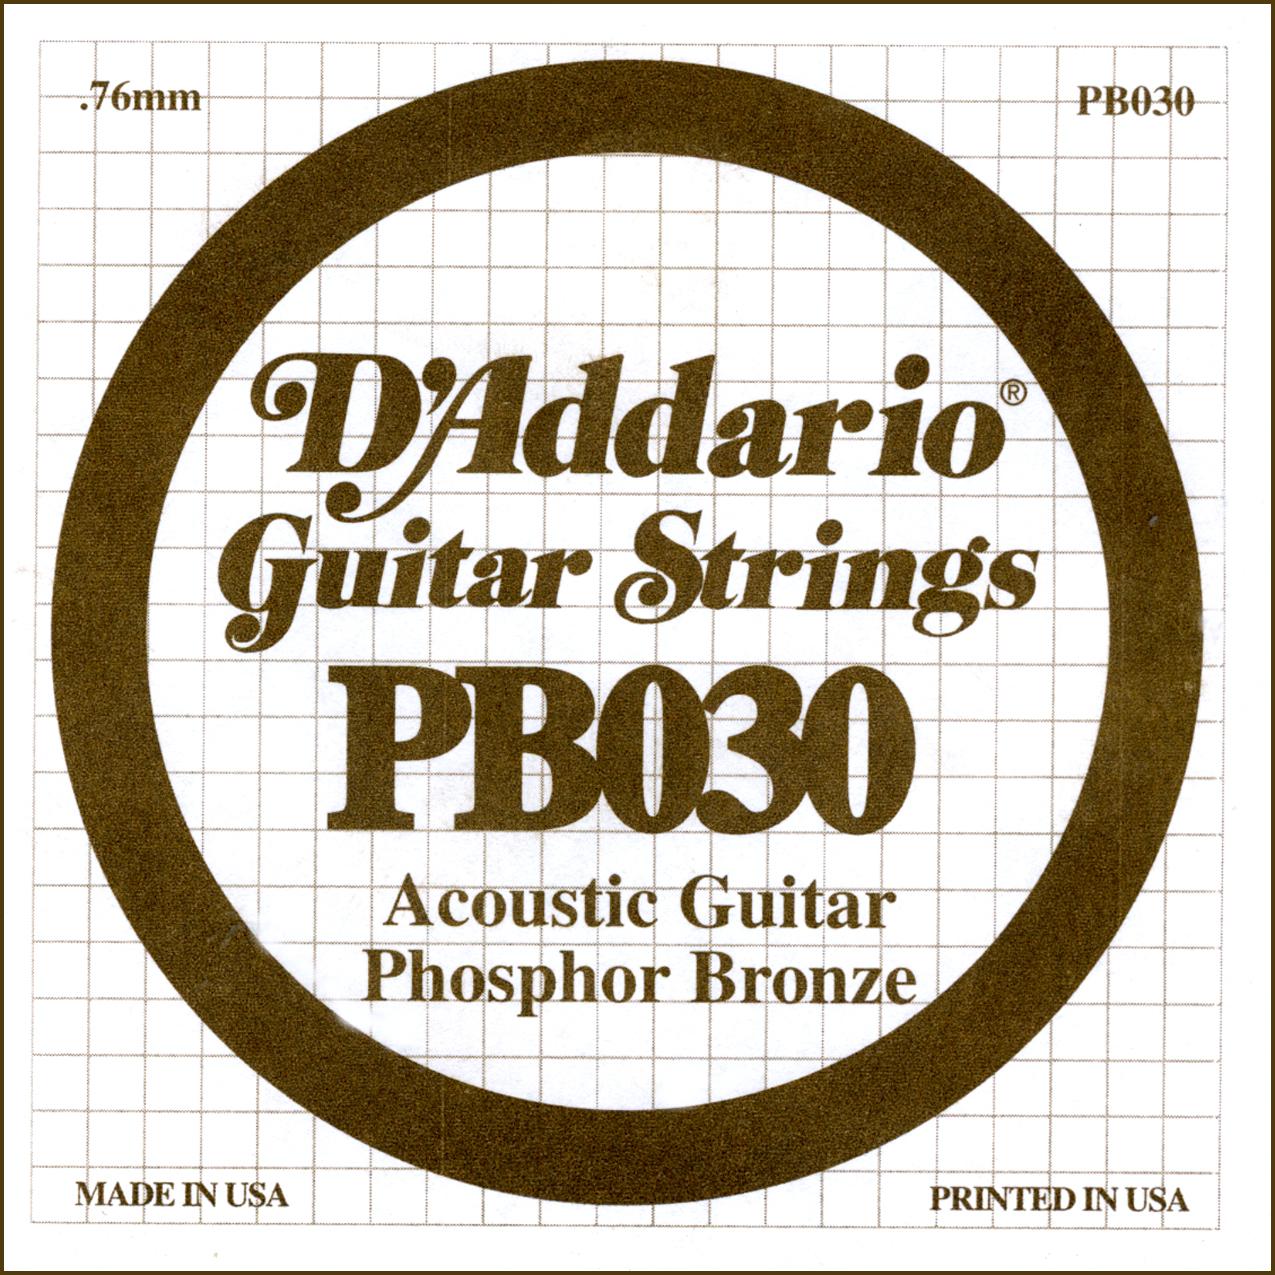 D'Addario Single Strings PBO30